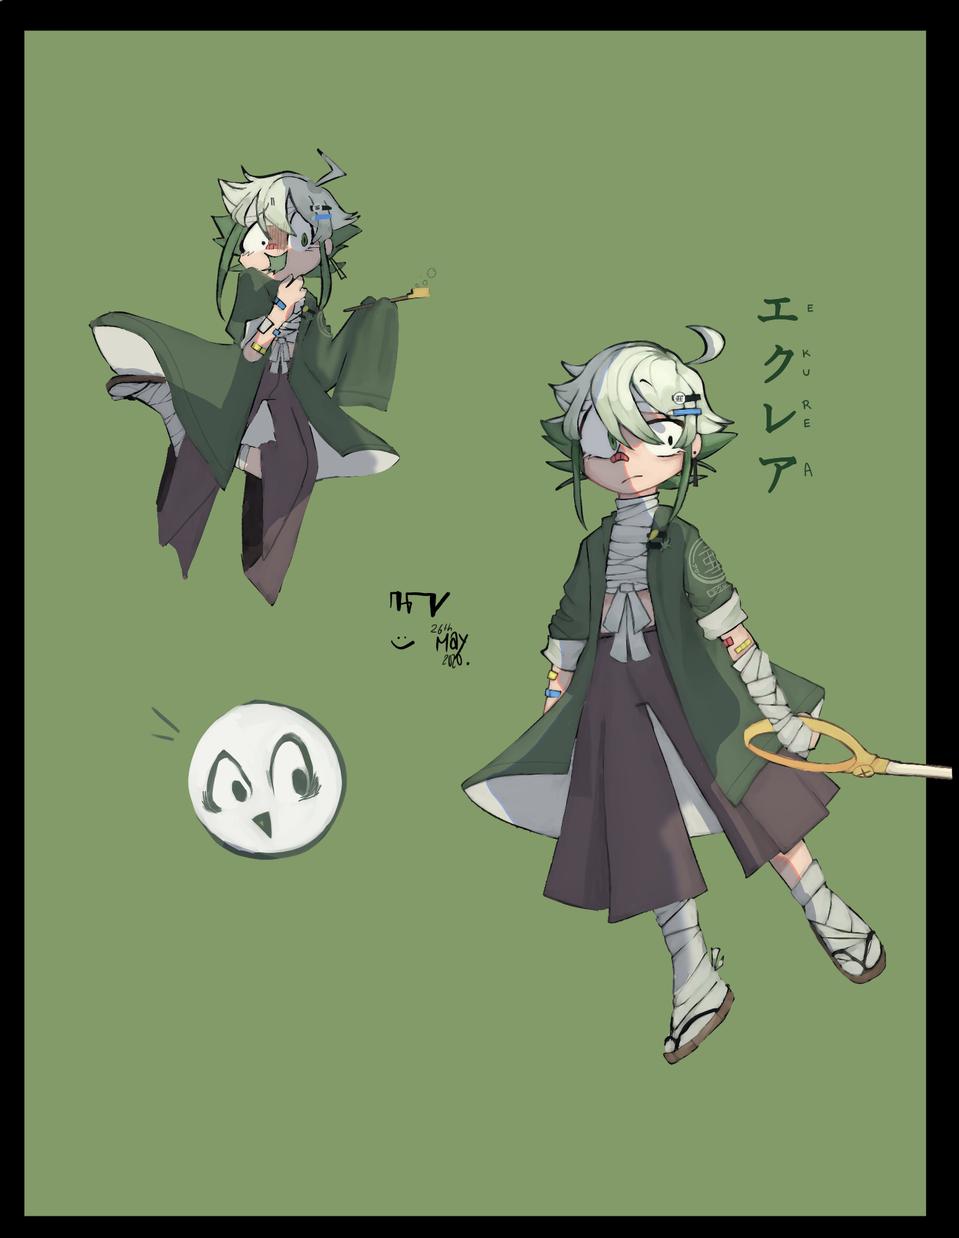 [MO4] gijinka Ekura! (not official) Illust of Kegezイラスト medibangpaint painting MO4 digital RPG MarikinOnline4 MyArt